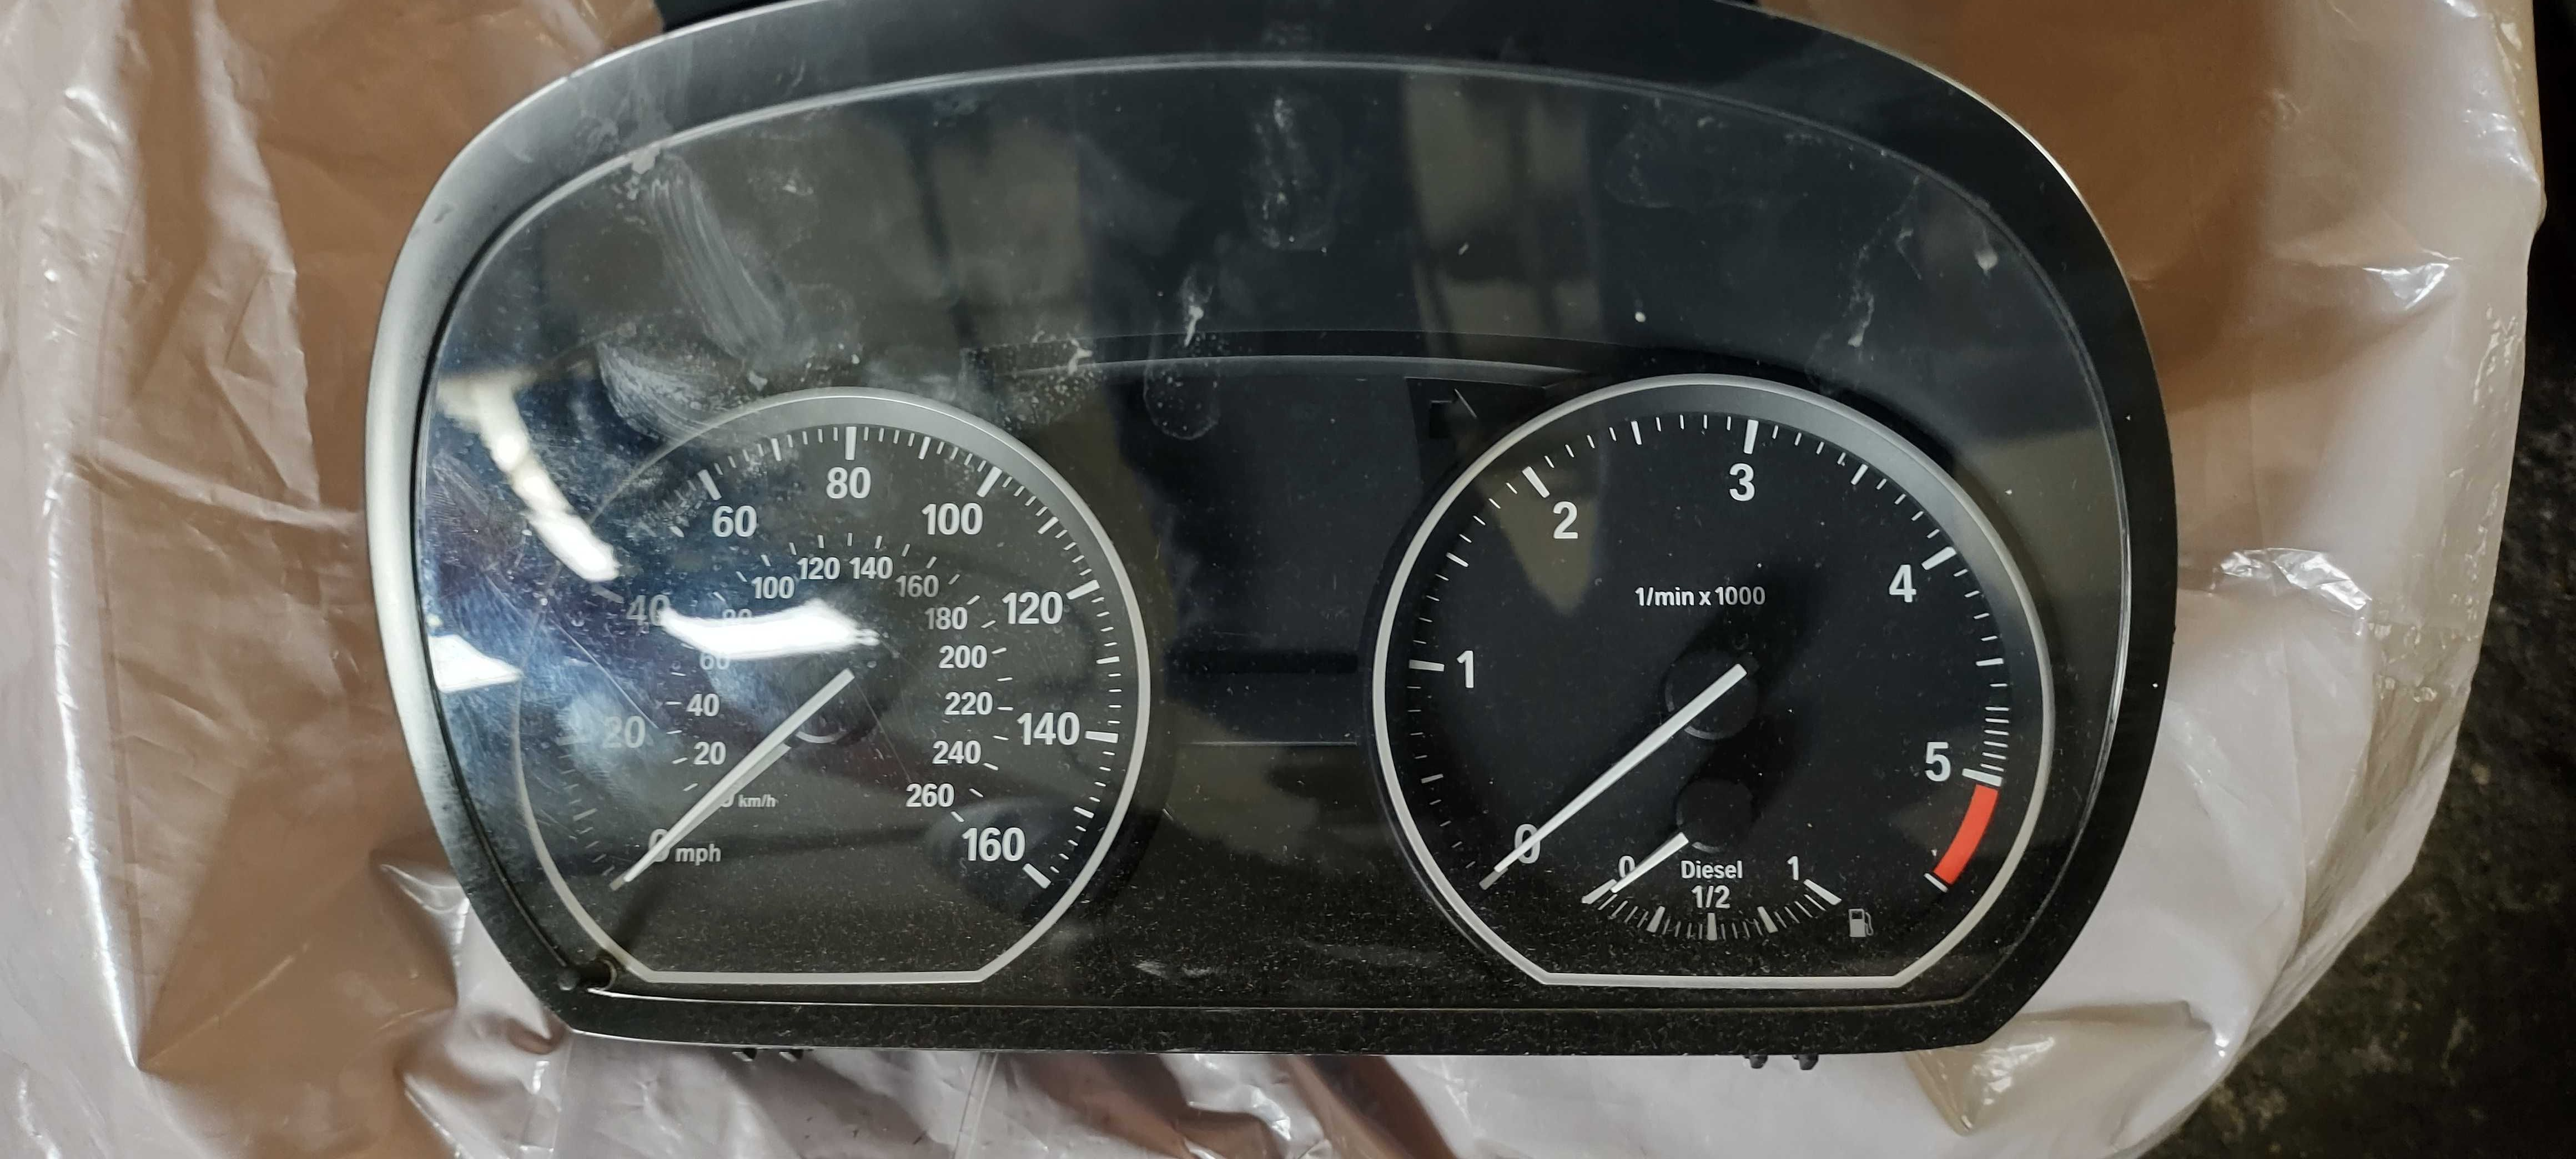 Километраж - /БМВ/BMW/- е81 123d N47D 204кс.